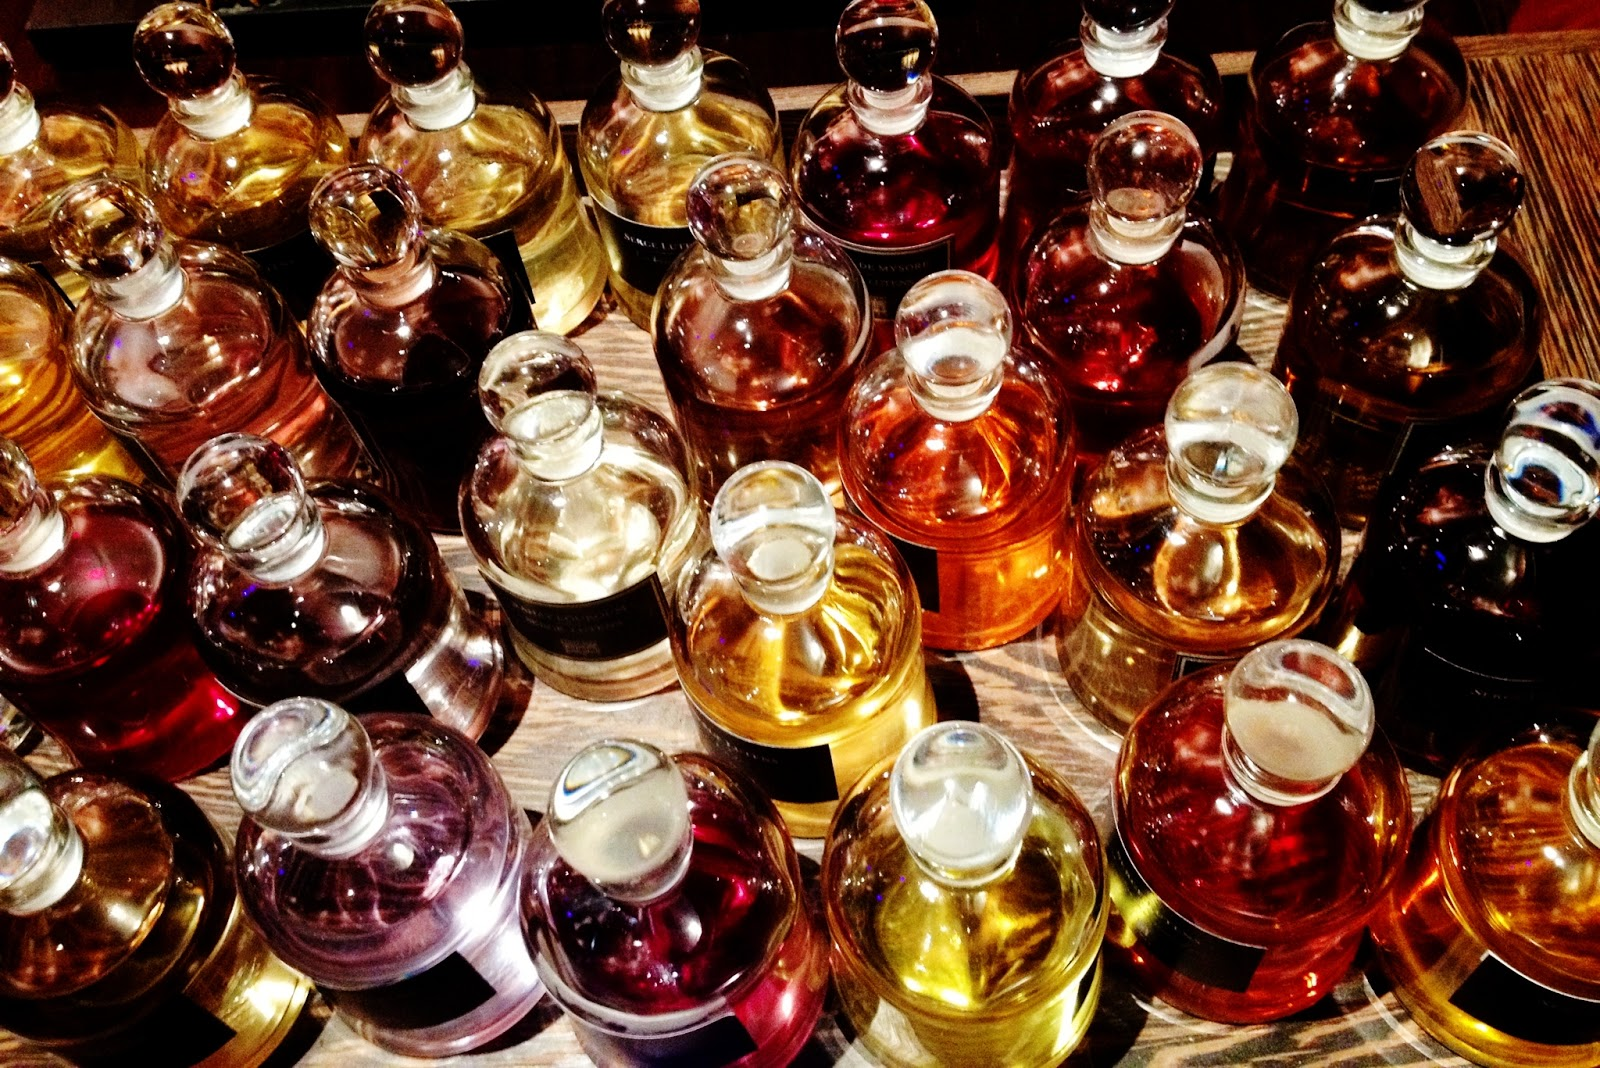 beautyfashion serge lutens calatorie in lumea parfumurilor. Black Bedroom Furniture Sets. Home Design Ideas